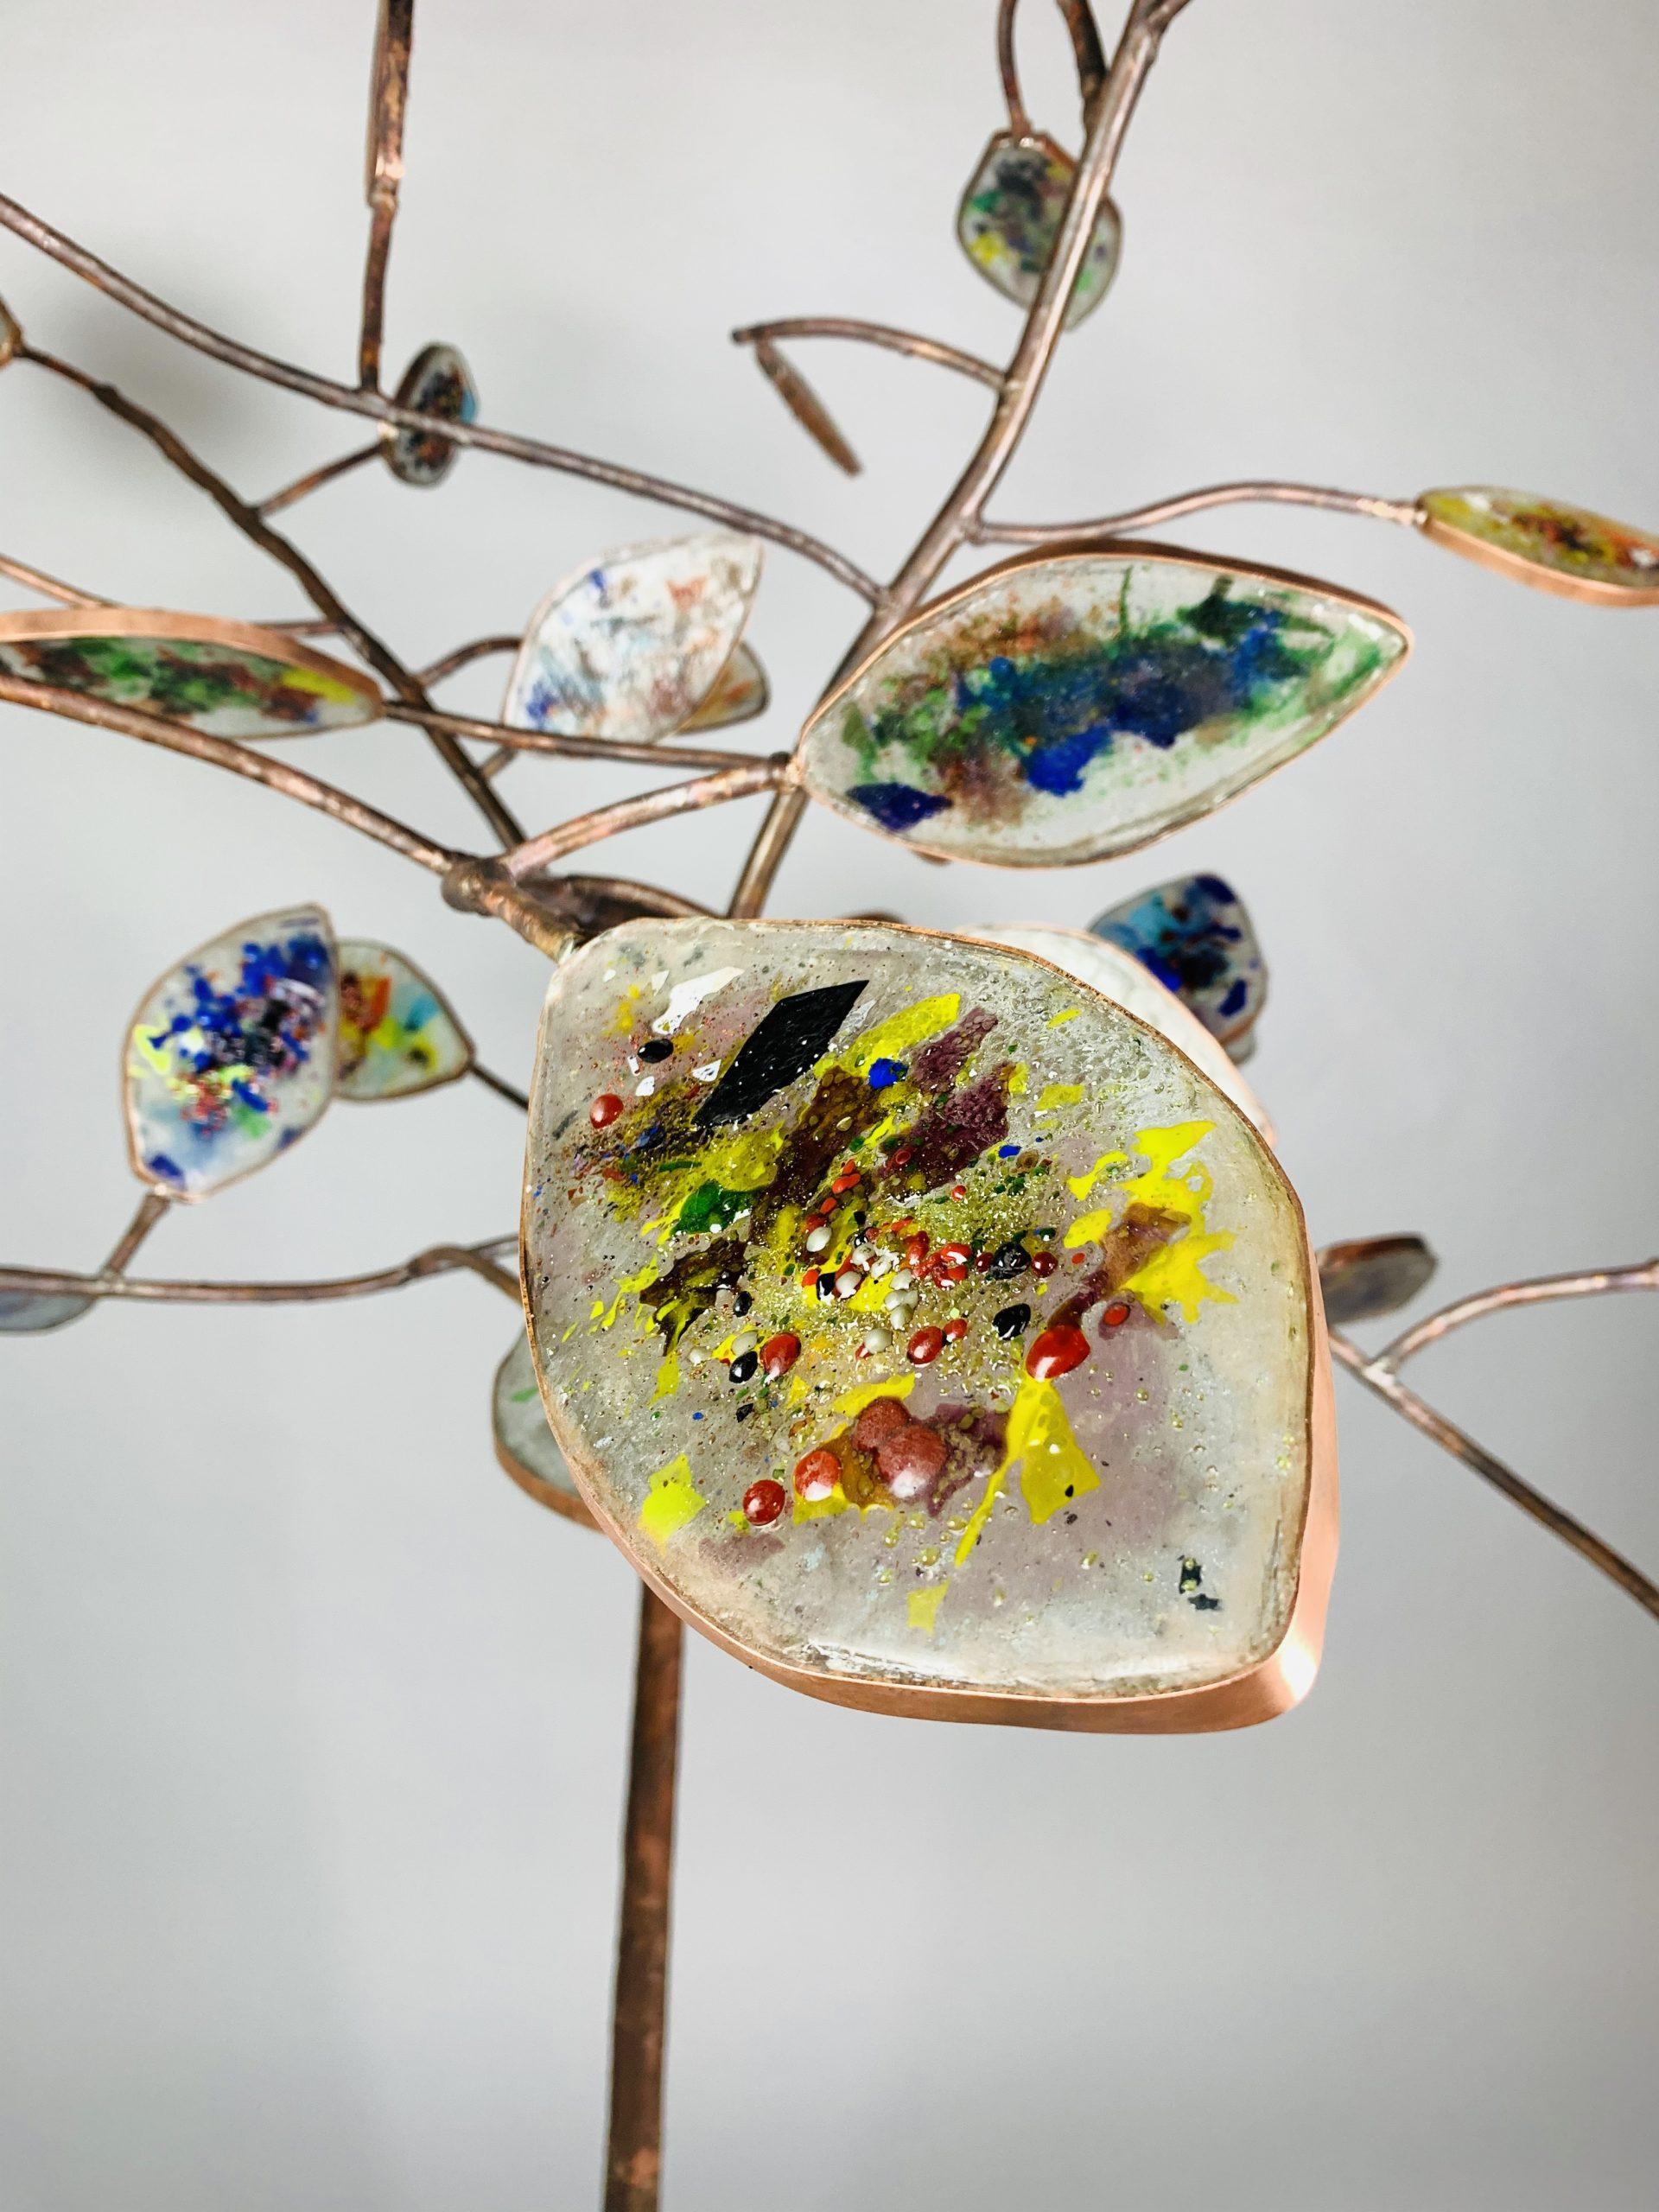 Tree of life 2,05 hoog x1,45x1,35 SJAAK SMETSERS 8